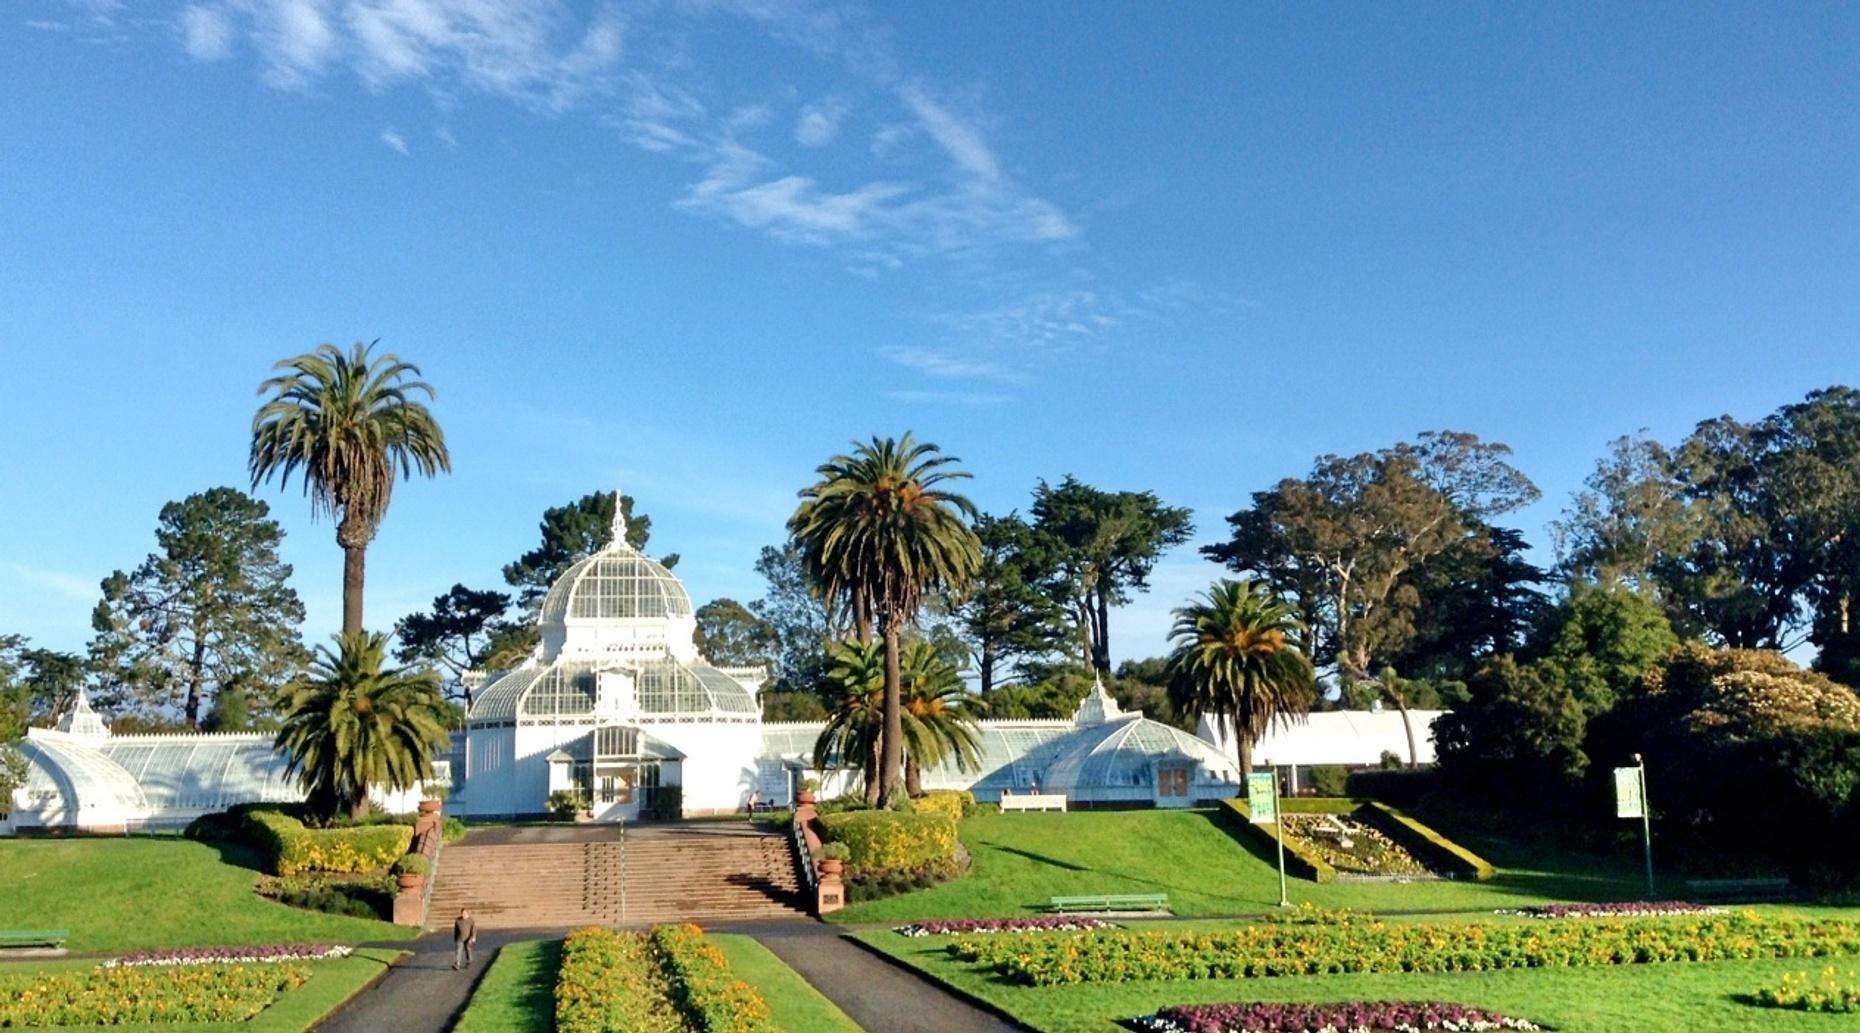 Golden Gate Park 10K Running Tour in San Francisco